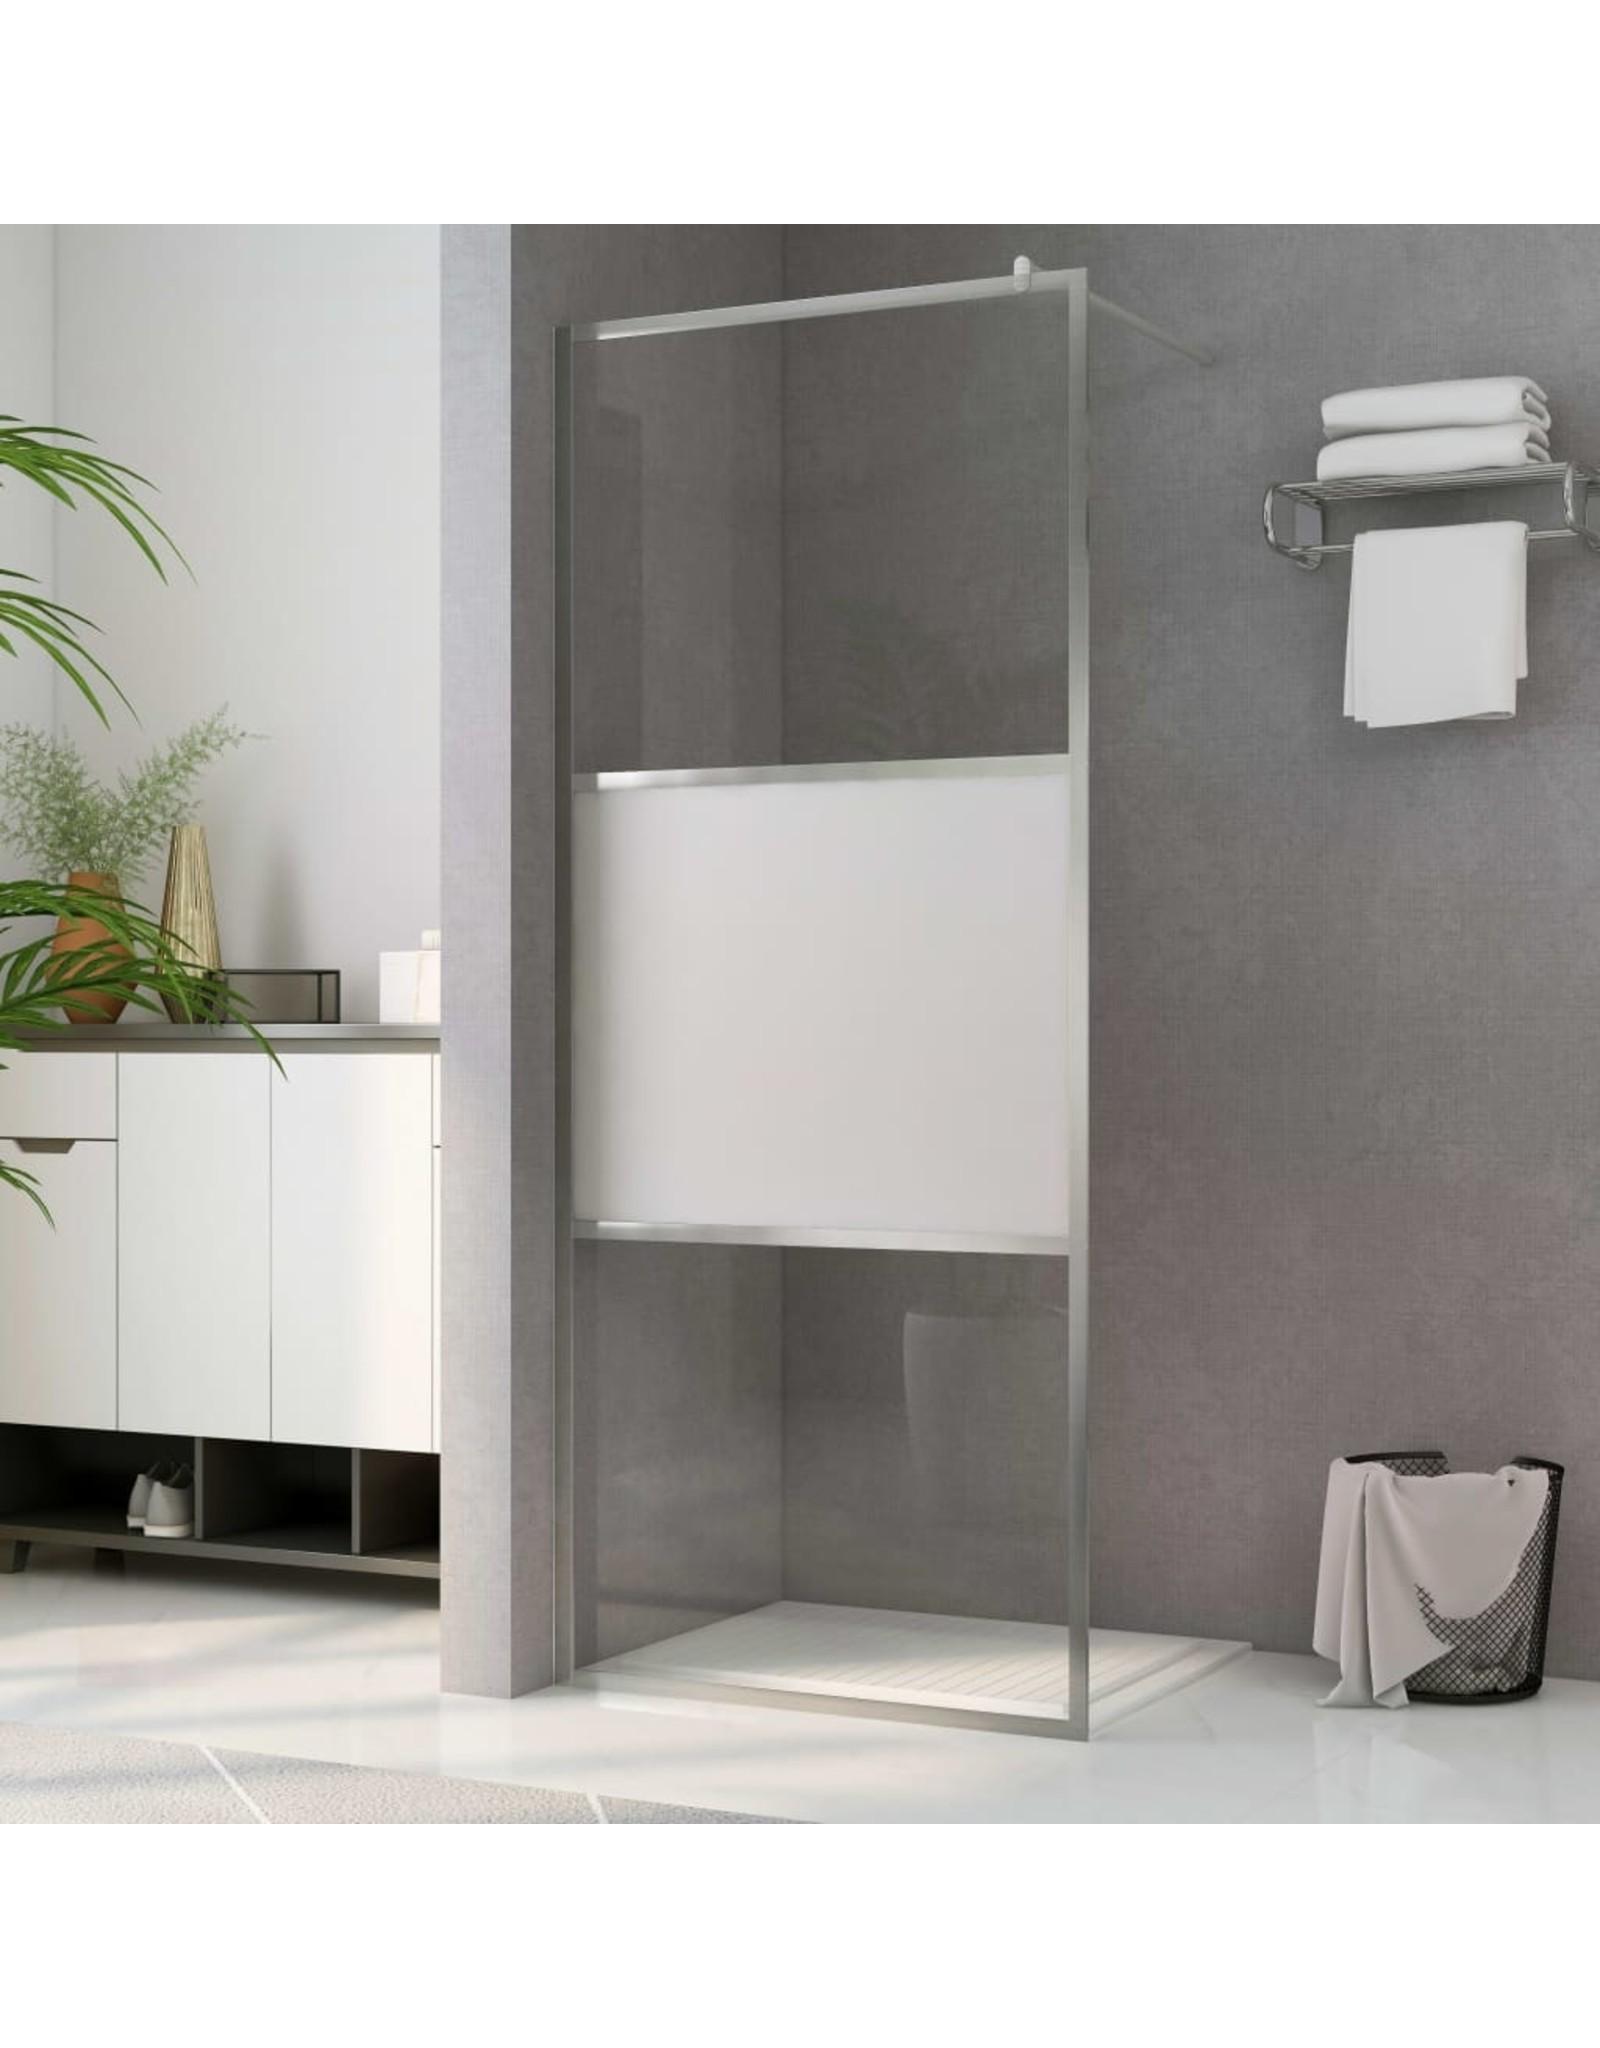 Inloopdouchewand halfmat 115x195 cm ESG-glas